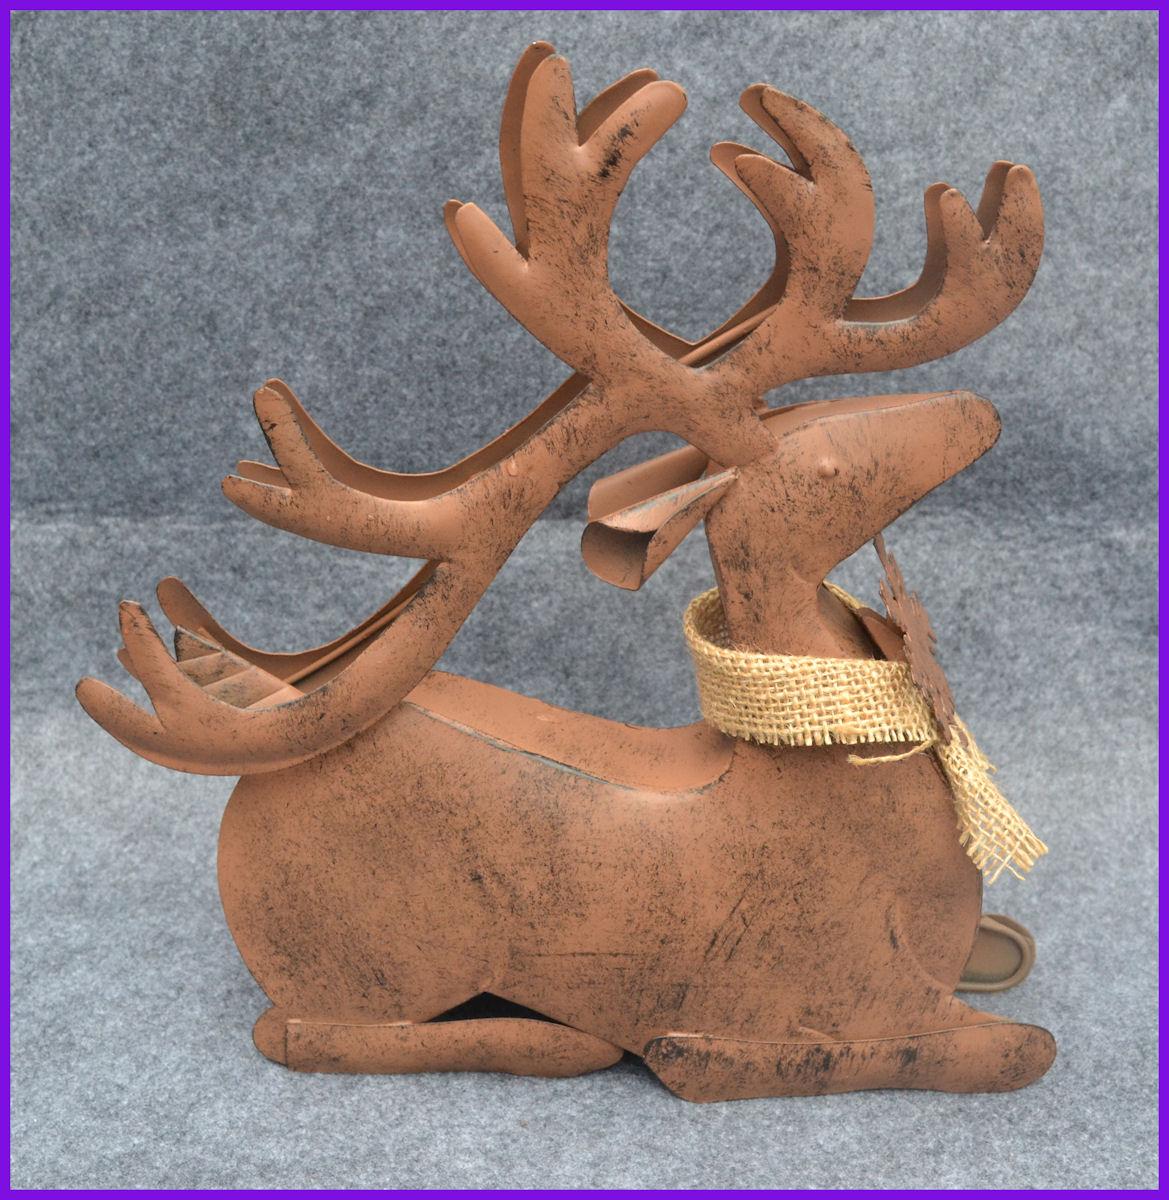 da-reindeer-9x11x2-inches-rd110902-sv-sm.jpg